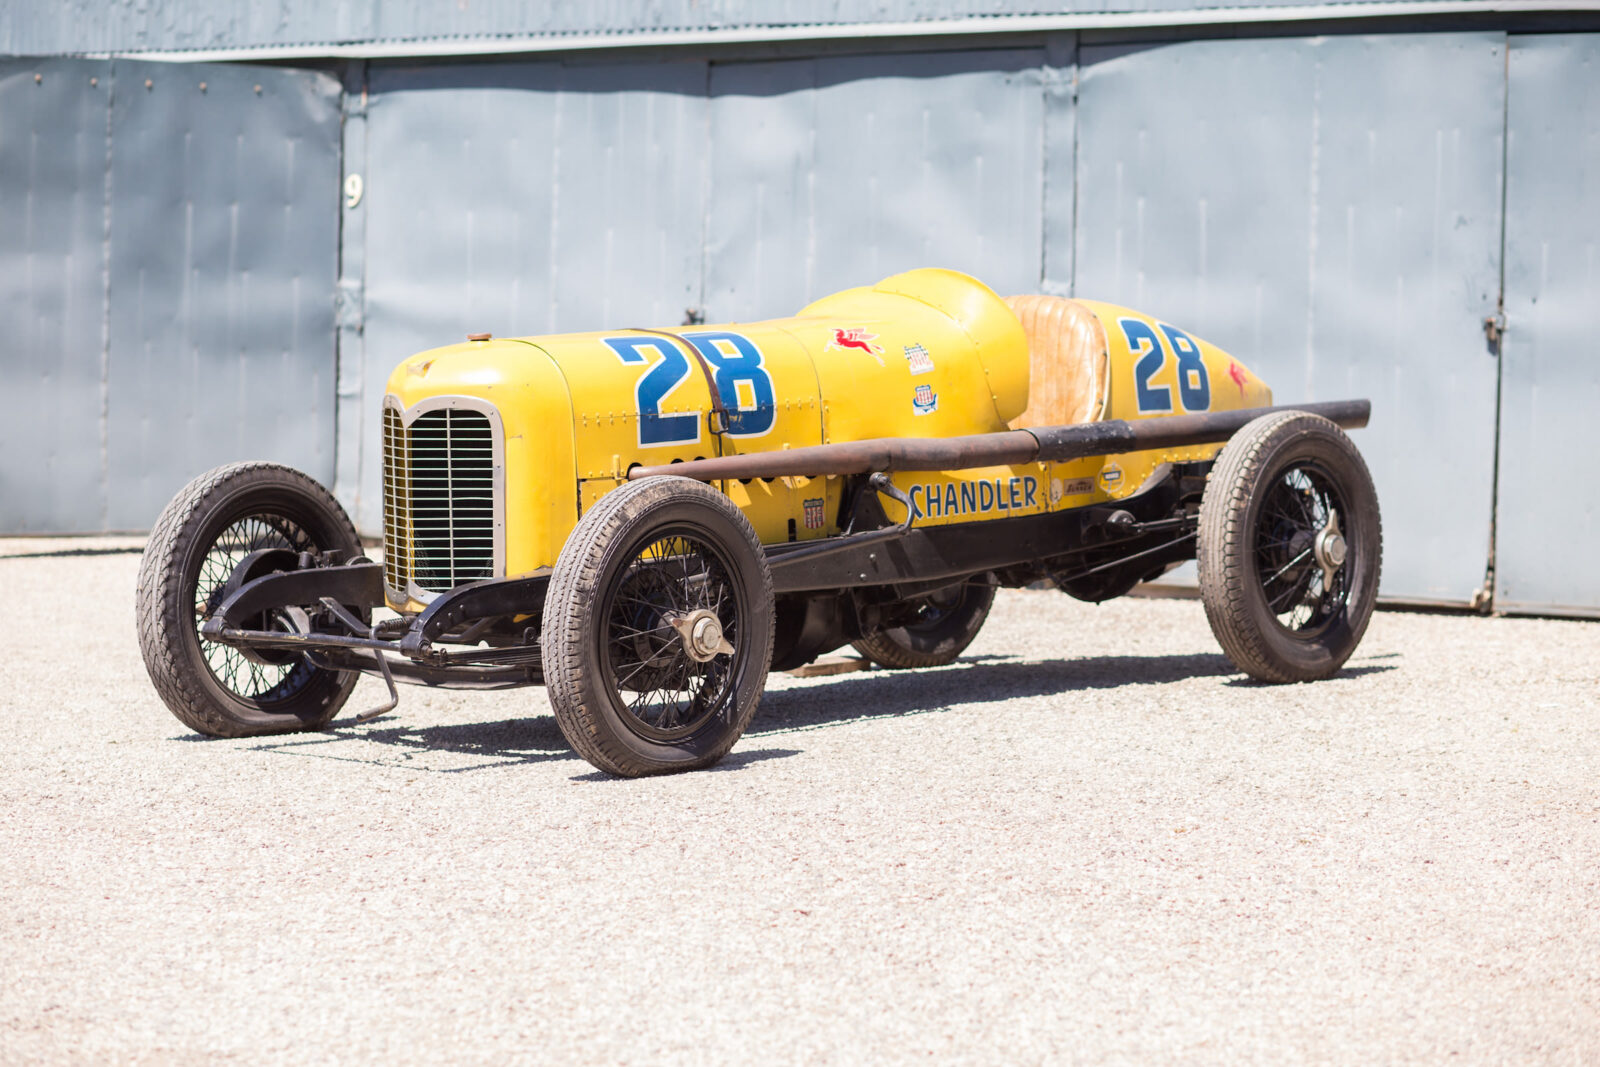 Chandler SIX Racing Car Main Hero Image 1600x1067 - 1926 Chandler Six Racing Car